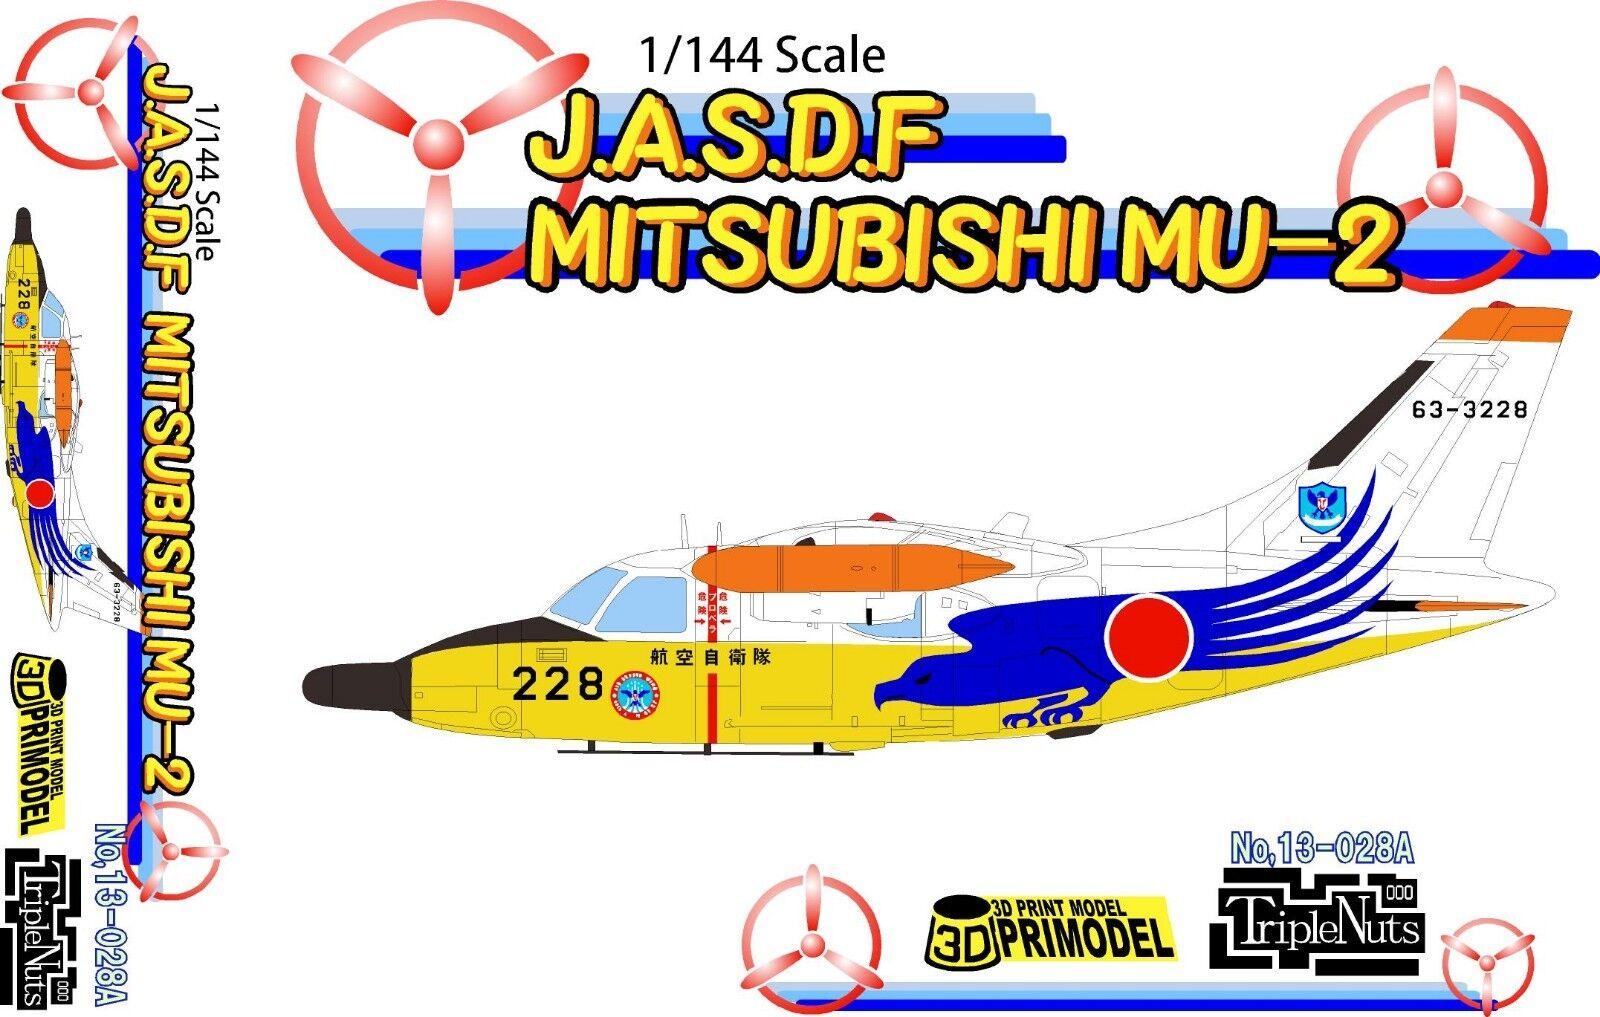 1 144 Modern Rescue Aircraft  Mitsubishi MU-2 [JASDF]   Triple Nuts